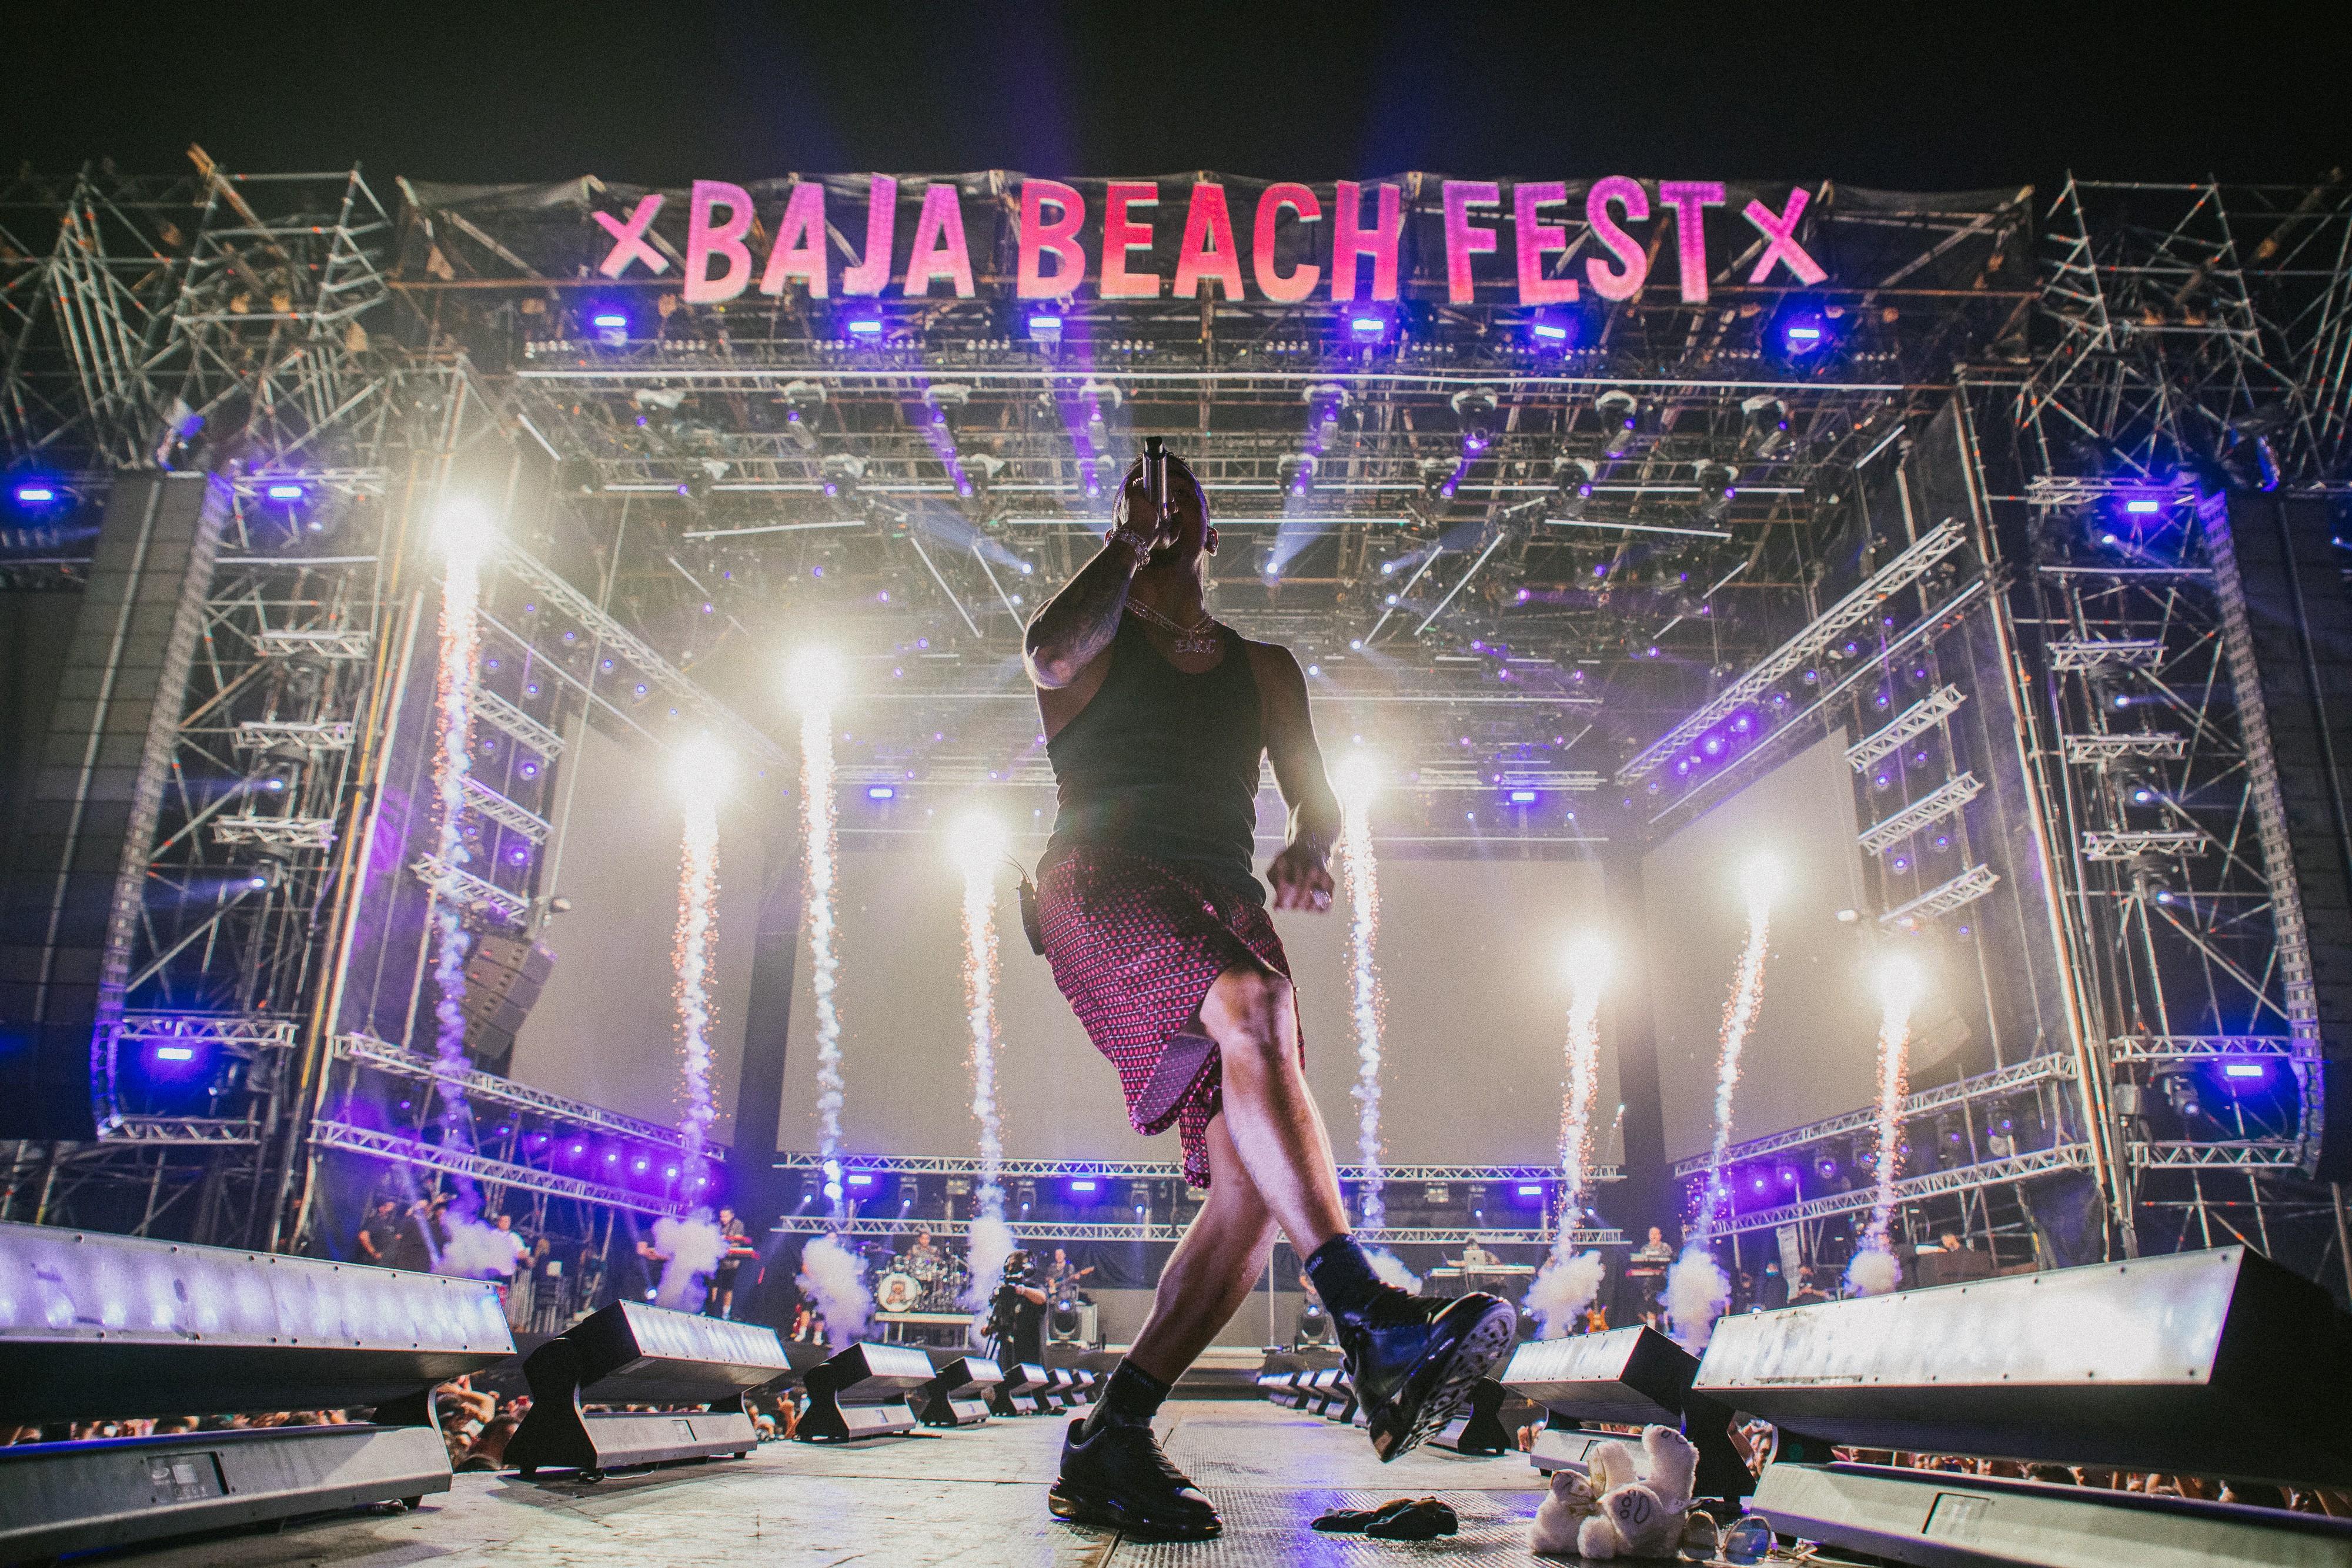 Amid COVID-19 Protocols, Mexico's Baja Beach Fest Returns With Ozuna, Karol G & More